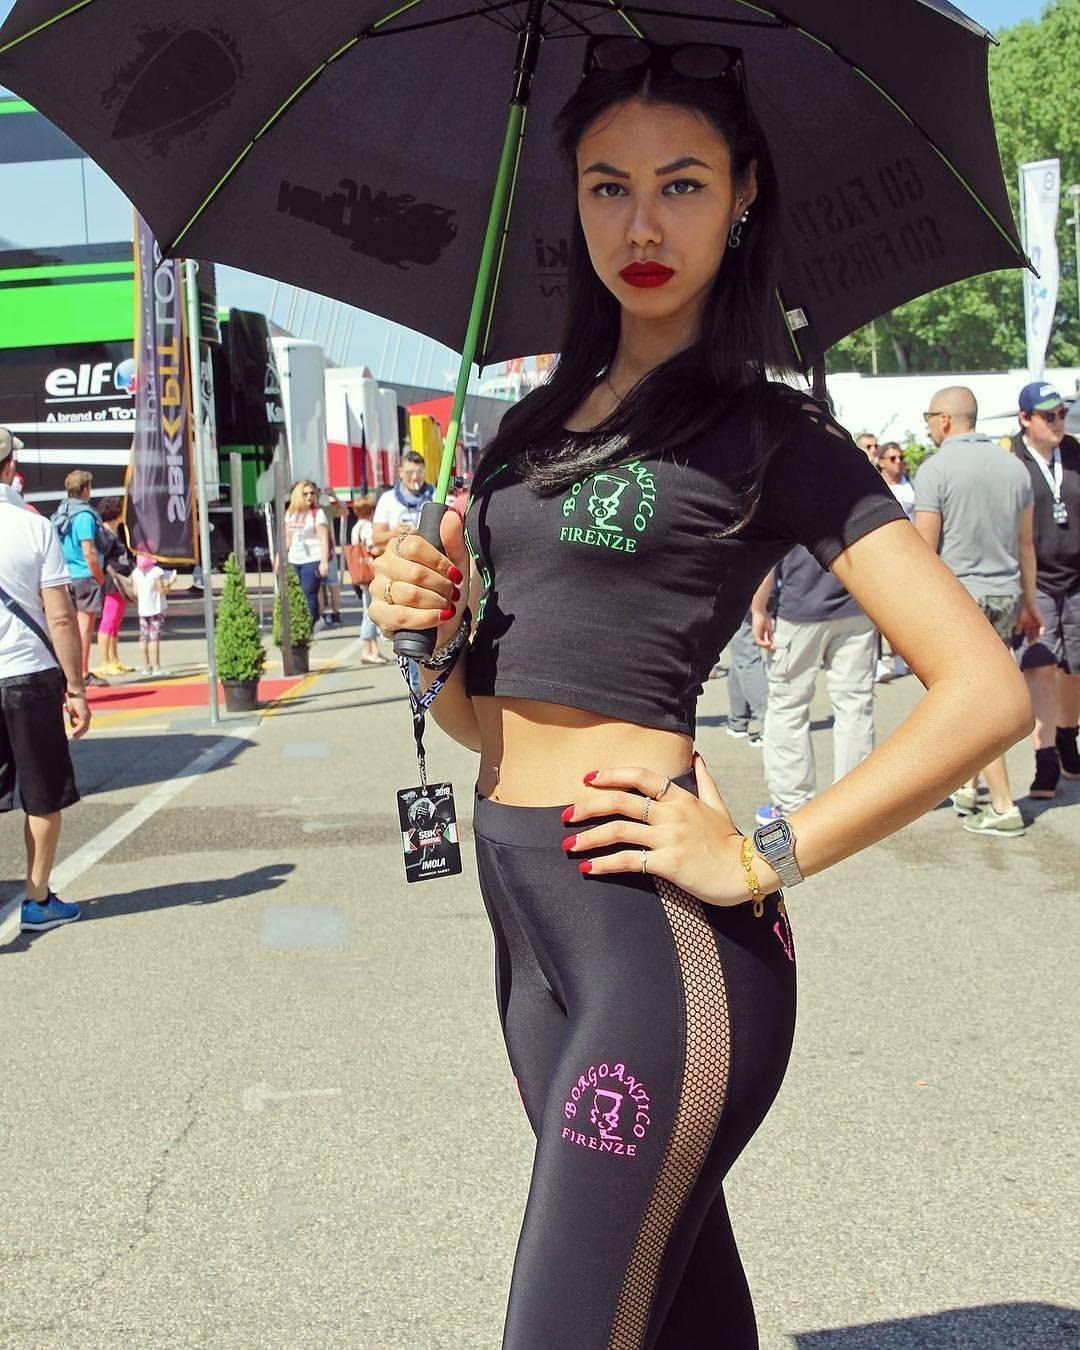 Top 100 Big Boobs Grid Girls Images | Sexiest Pit Girls, Hottest Umbrella Girls of F1, MotoGP HD ...